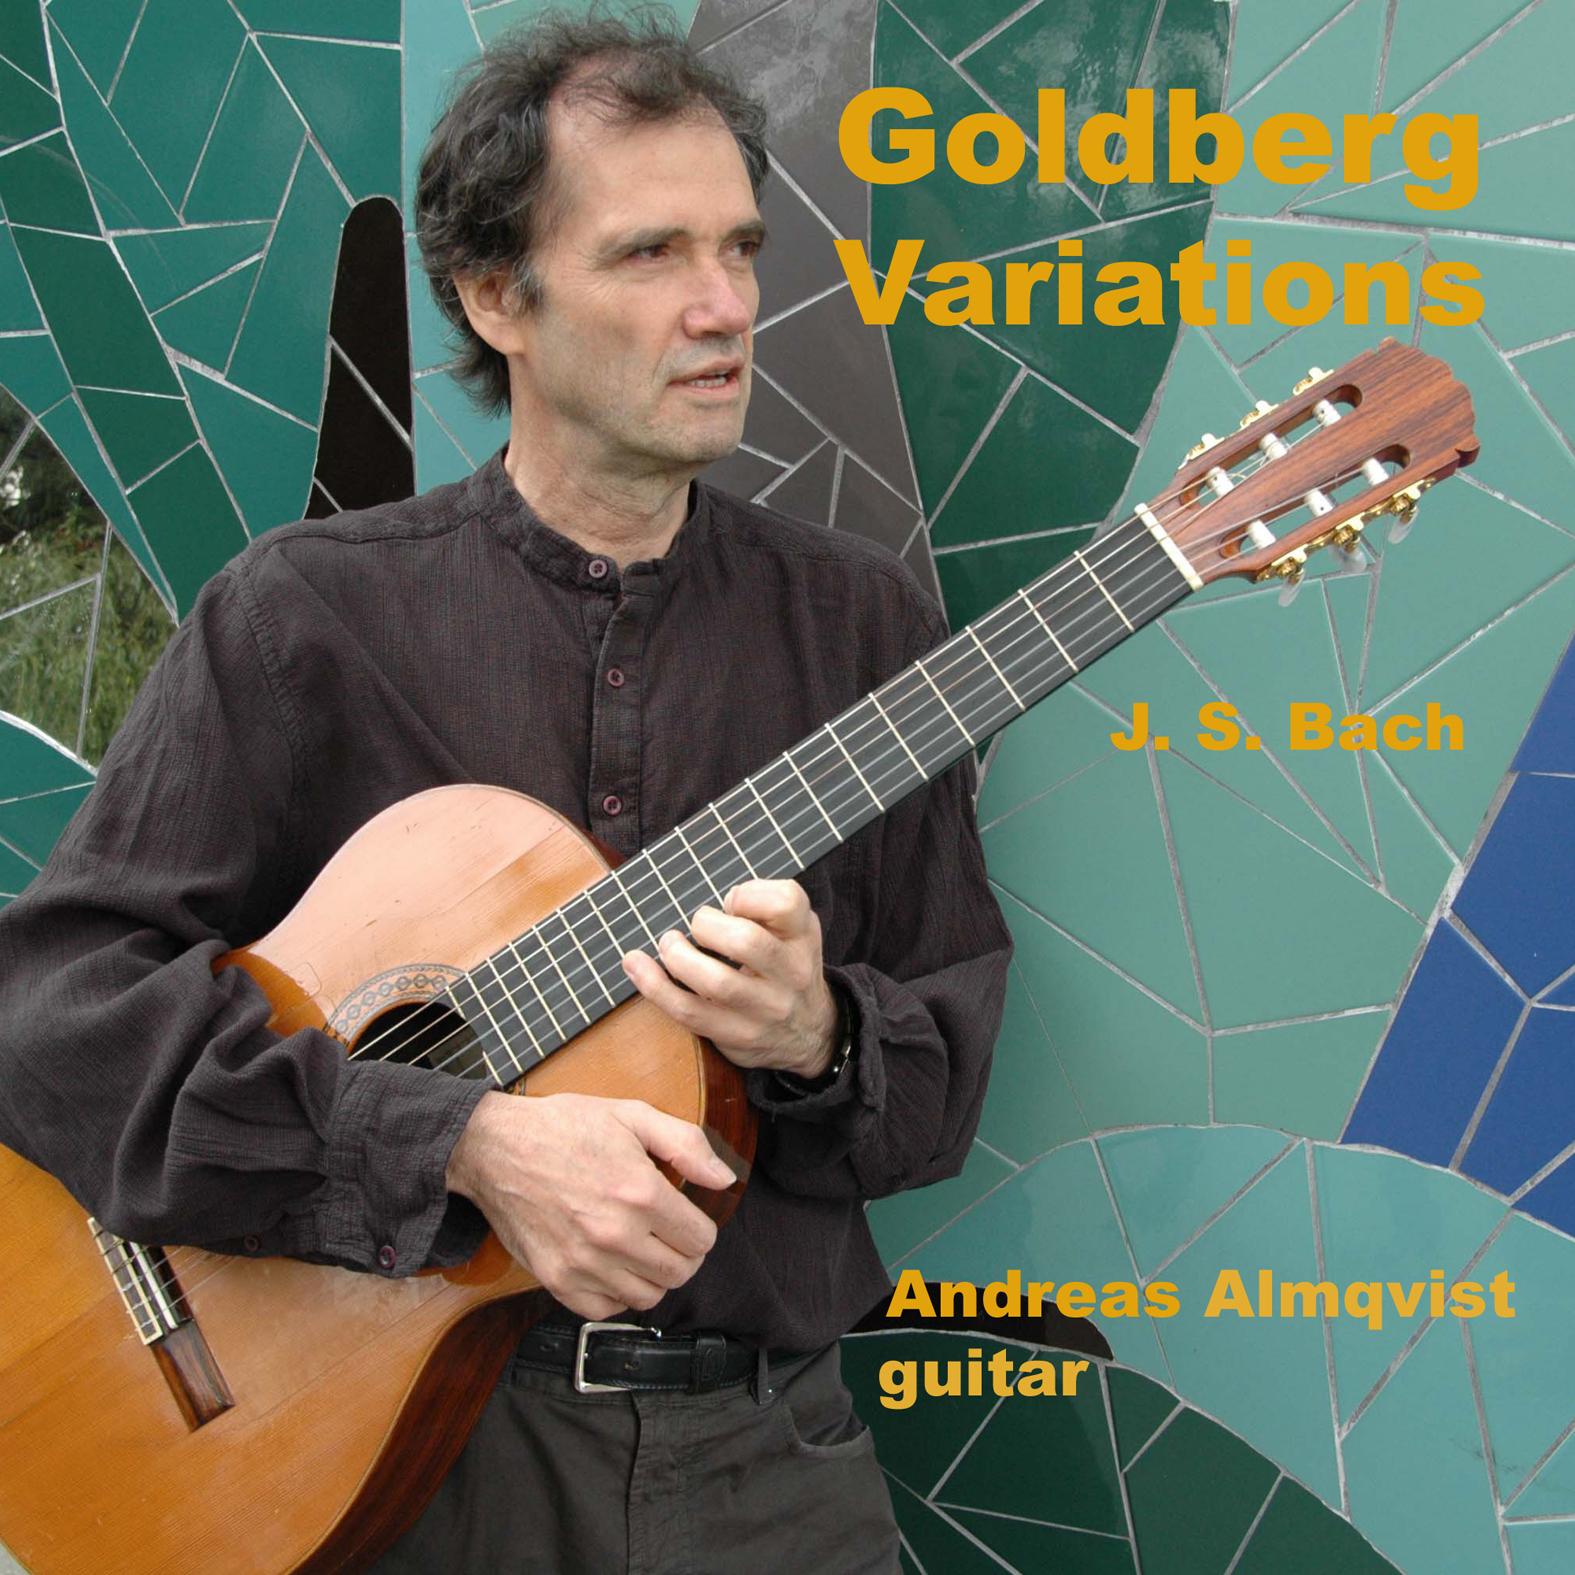 Goldberg Variations (JS Bach) : Andreas Almqvist